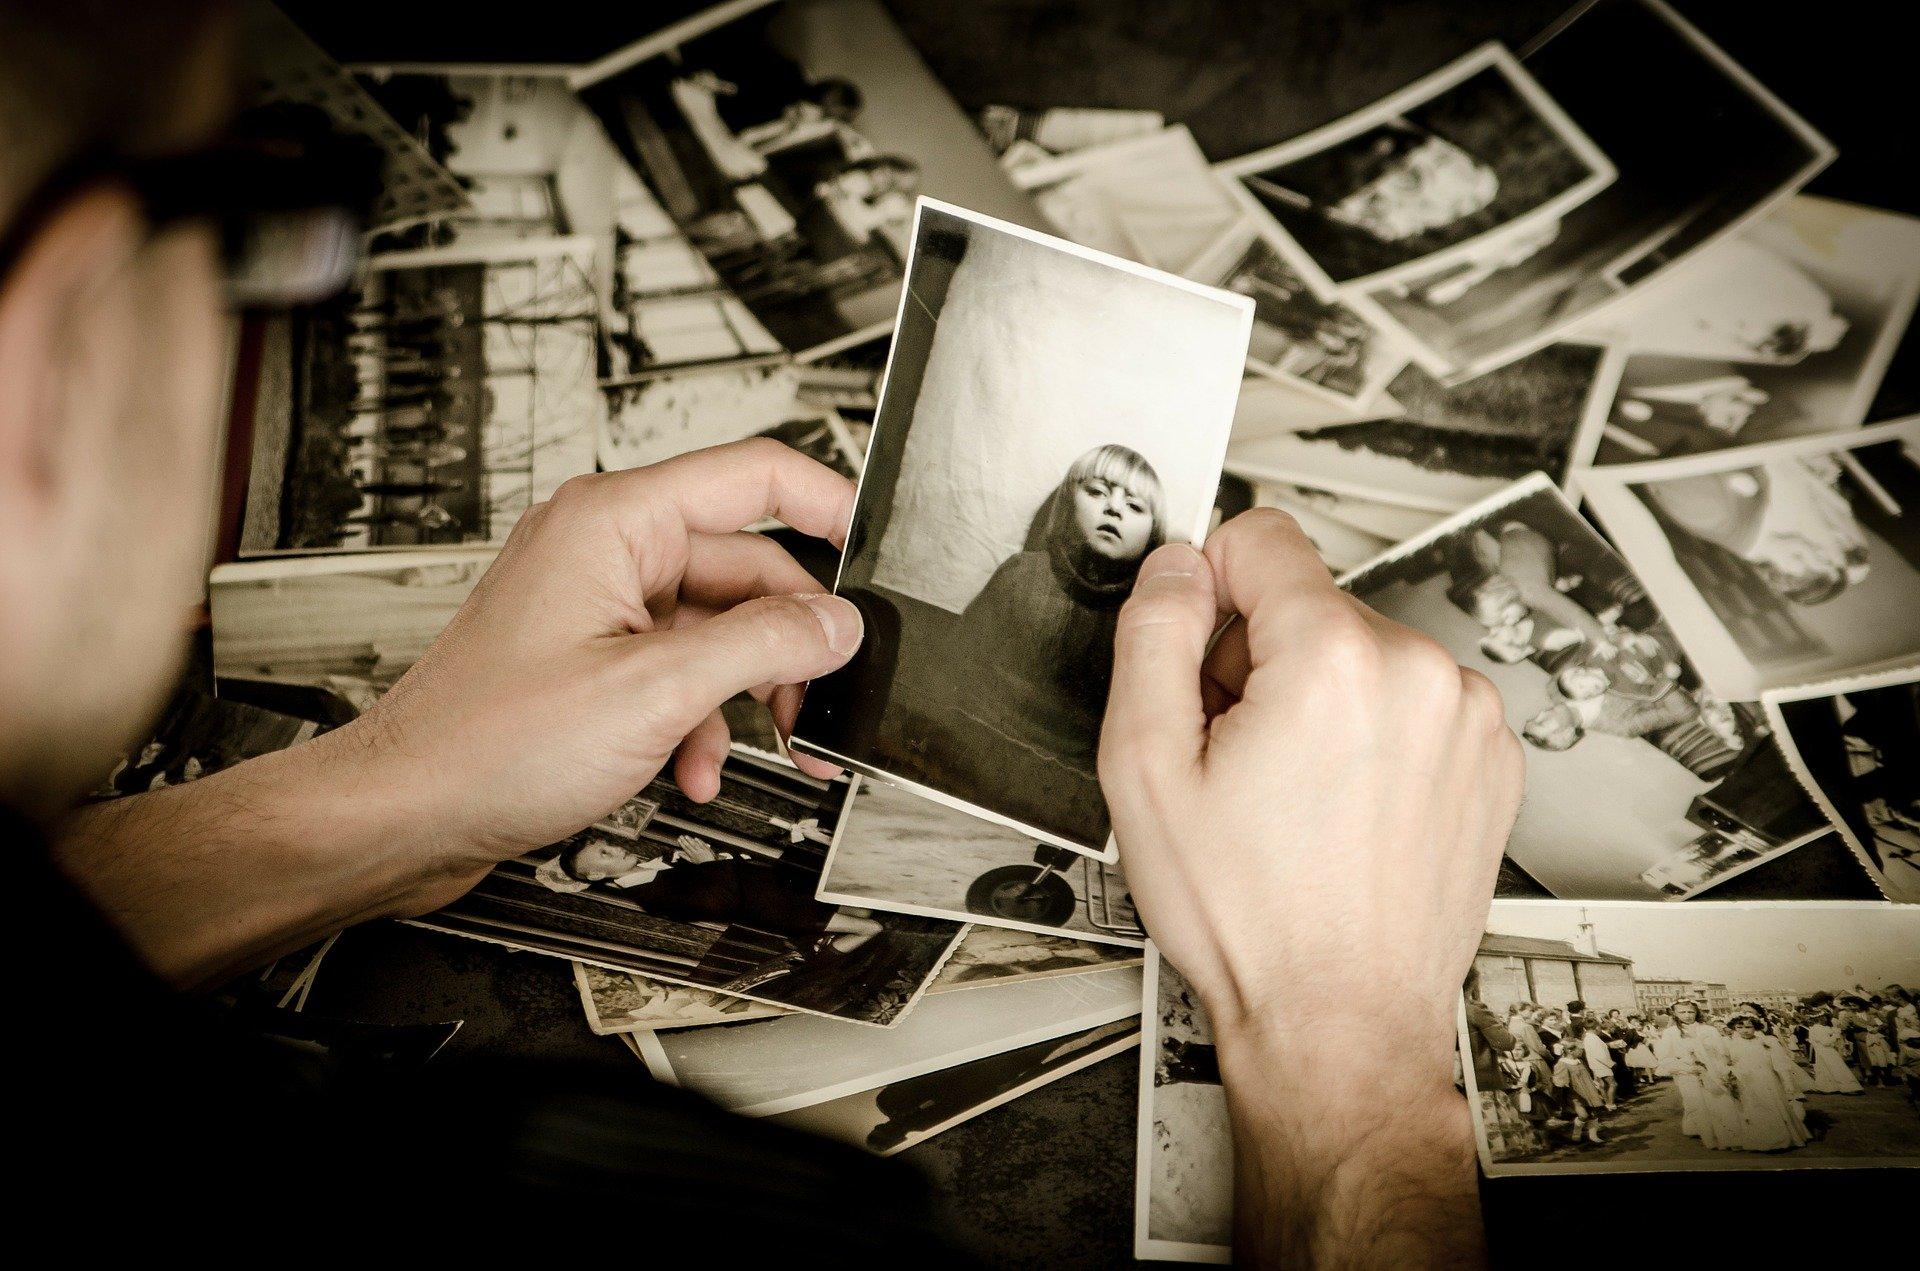 Fotos scannen lassen